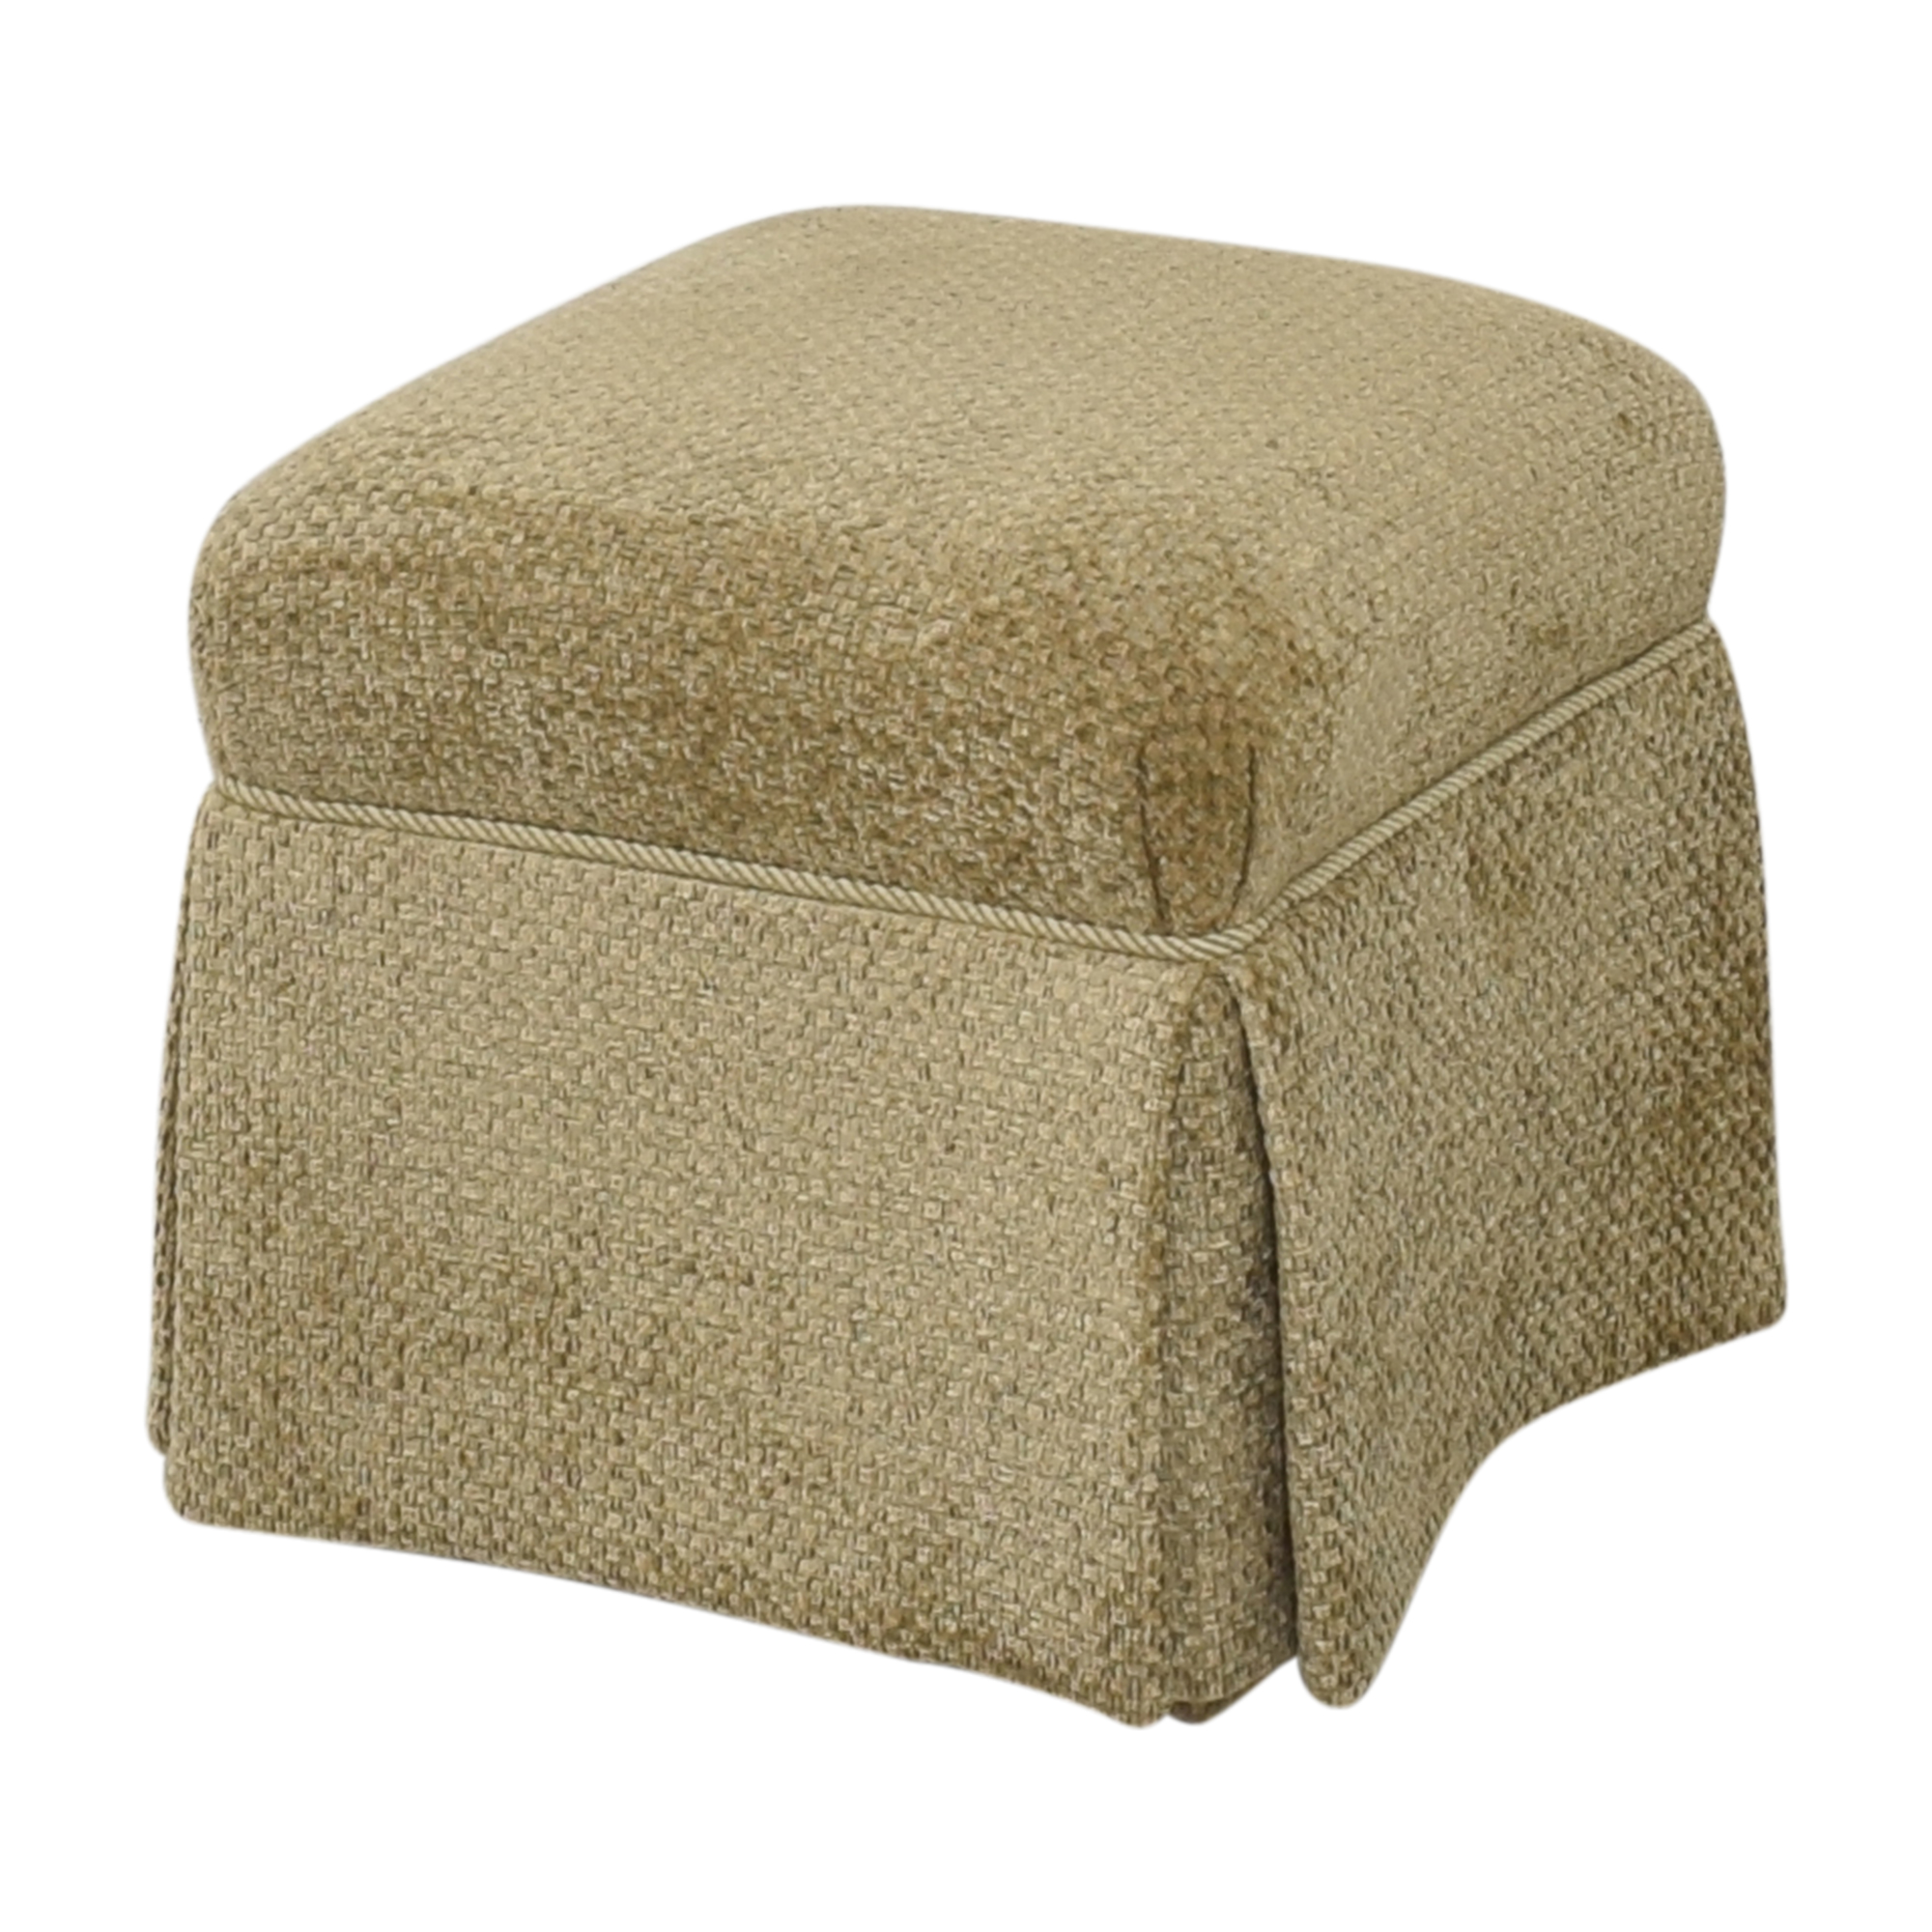 Sherrill Furniture Sherrill Furniture Skirted Ottoman Chairs